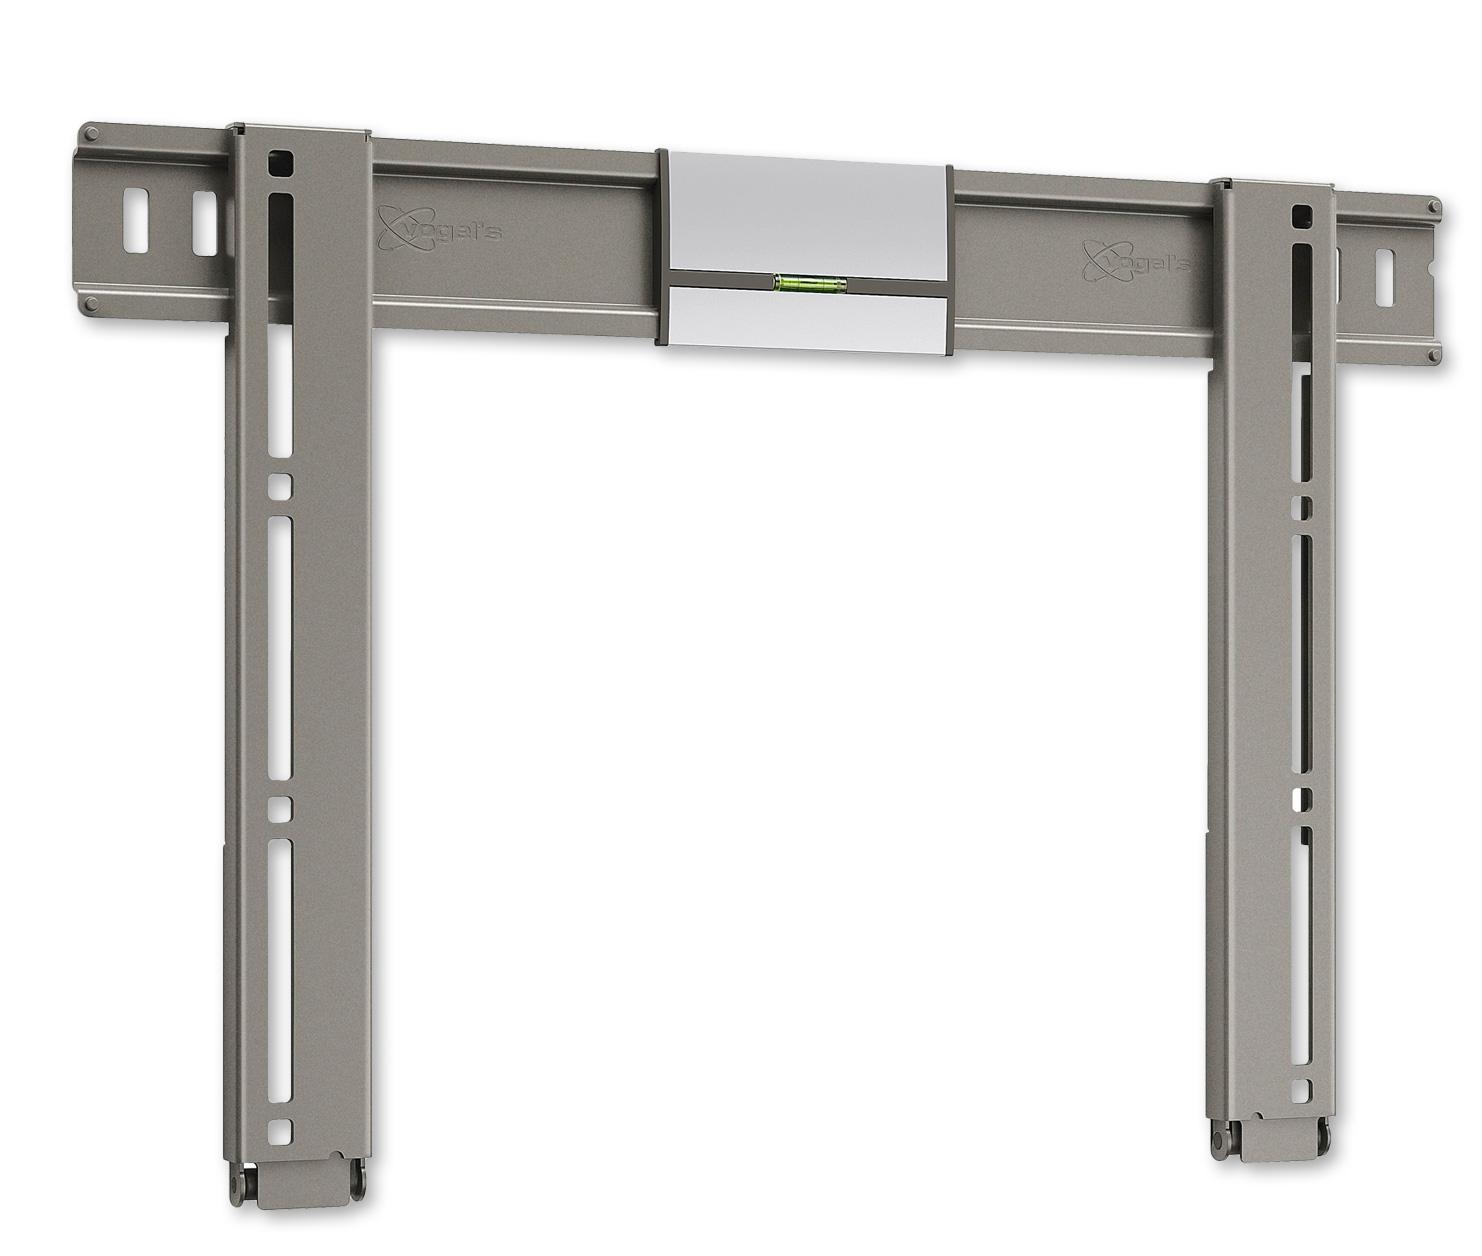 vogel thin 205 wand halterung 66 bis 139 cm led tv tft 100x100 bis 400x400 ebay. Black Bedroom Furniture Sets. Home Design Ideas